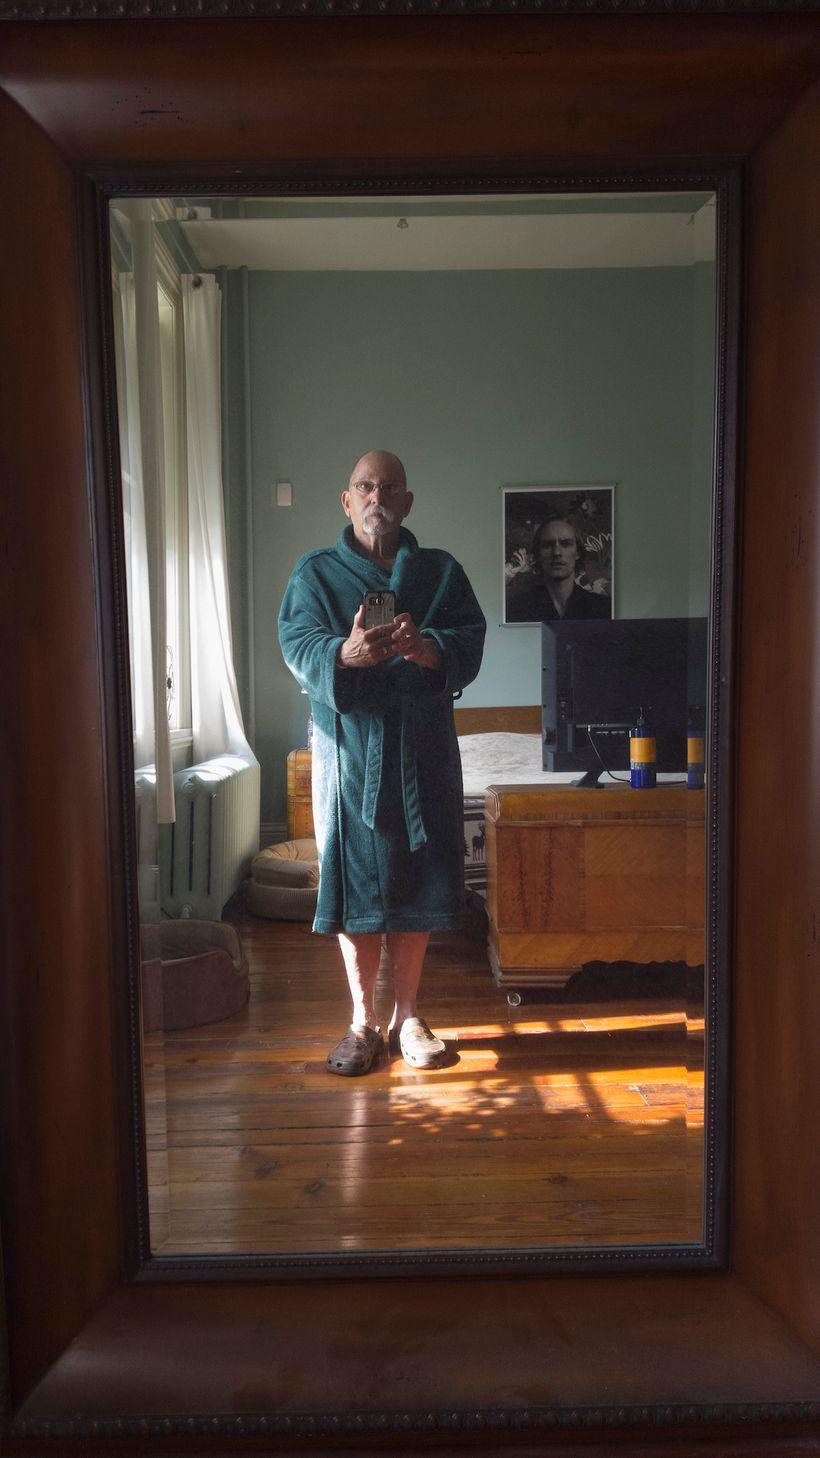 Michael Northrup, 9:00 hour, self-portrait